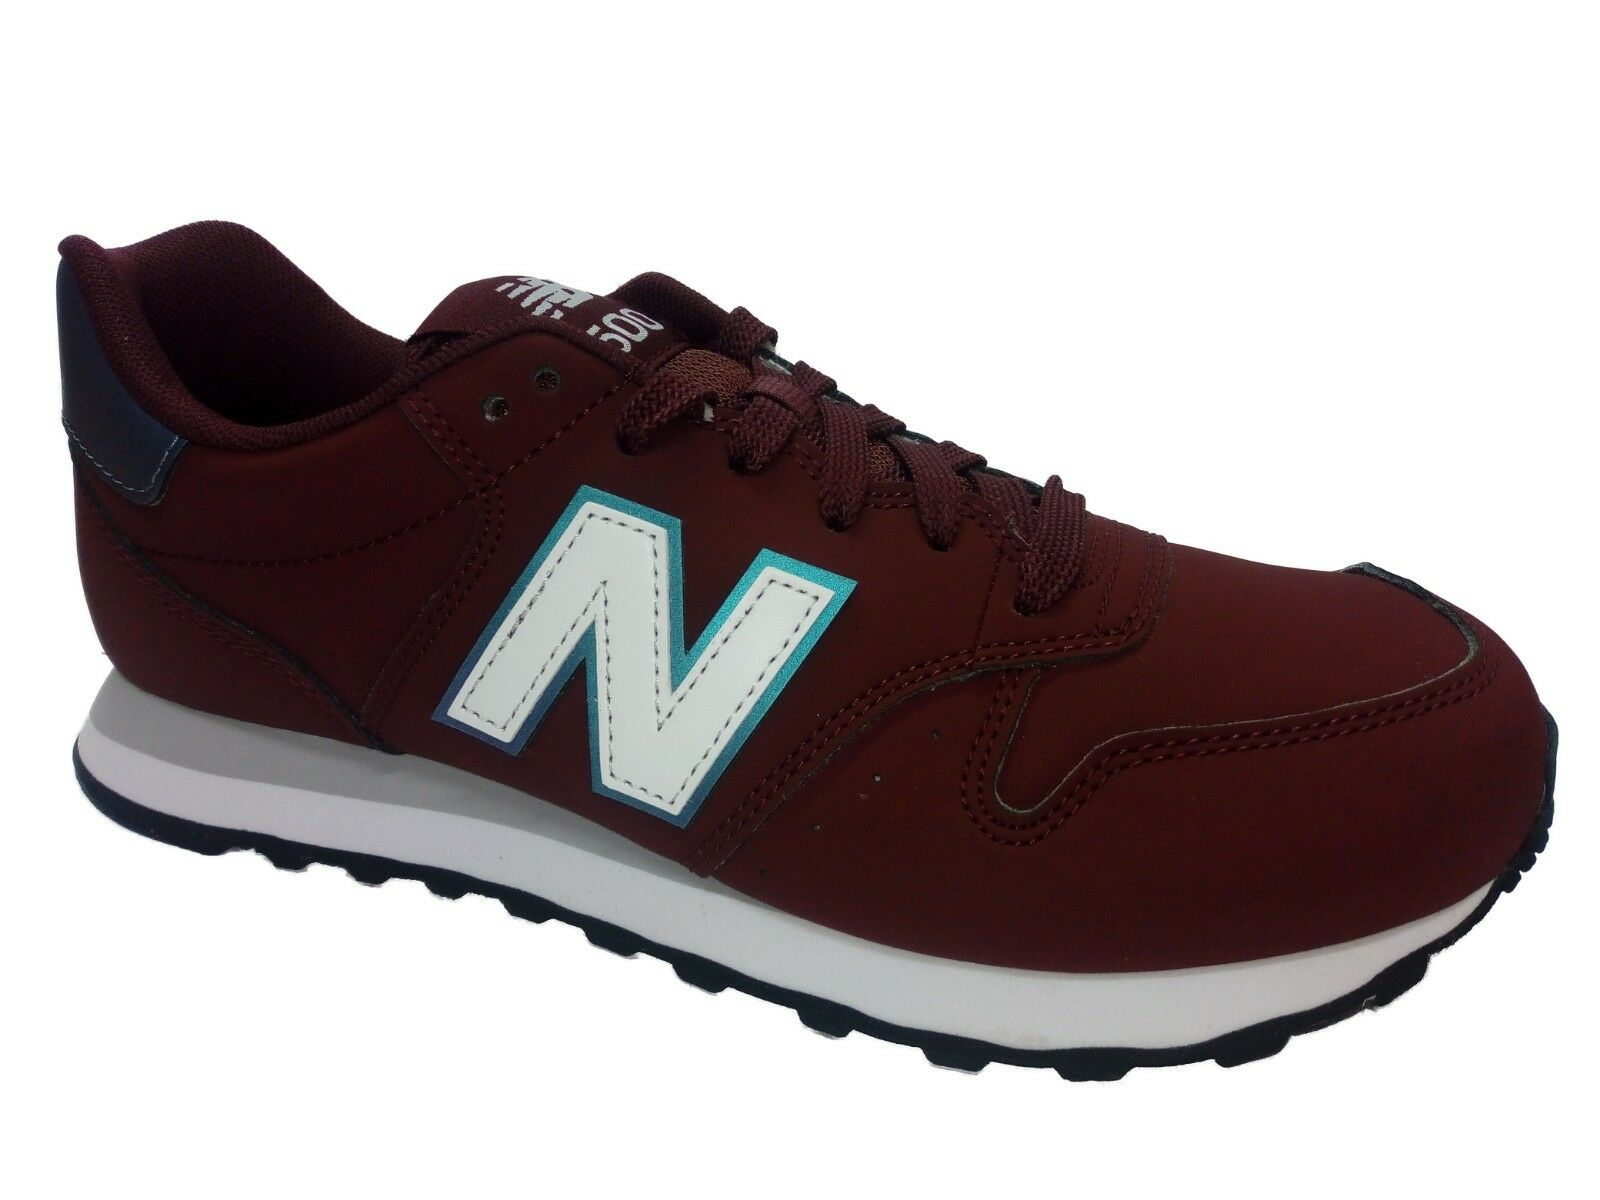 NEW BALANCE chaussures femmes GINNASTICA GW500BIP INVERNALE BORDO tg 36-37-38-39-40